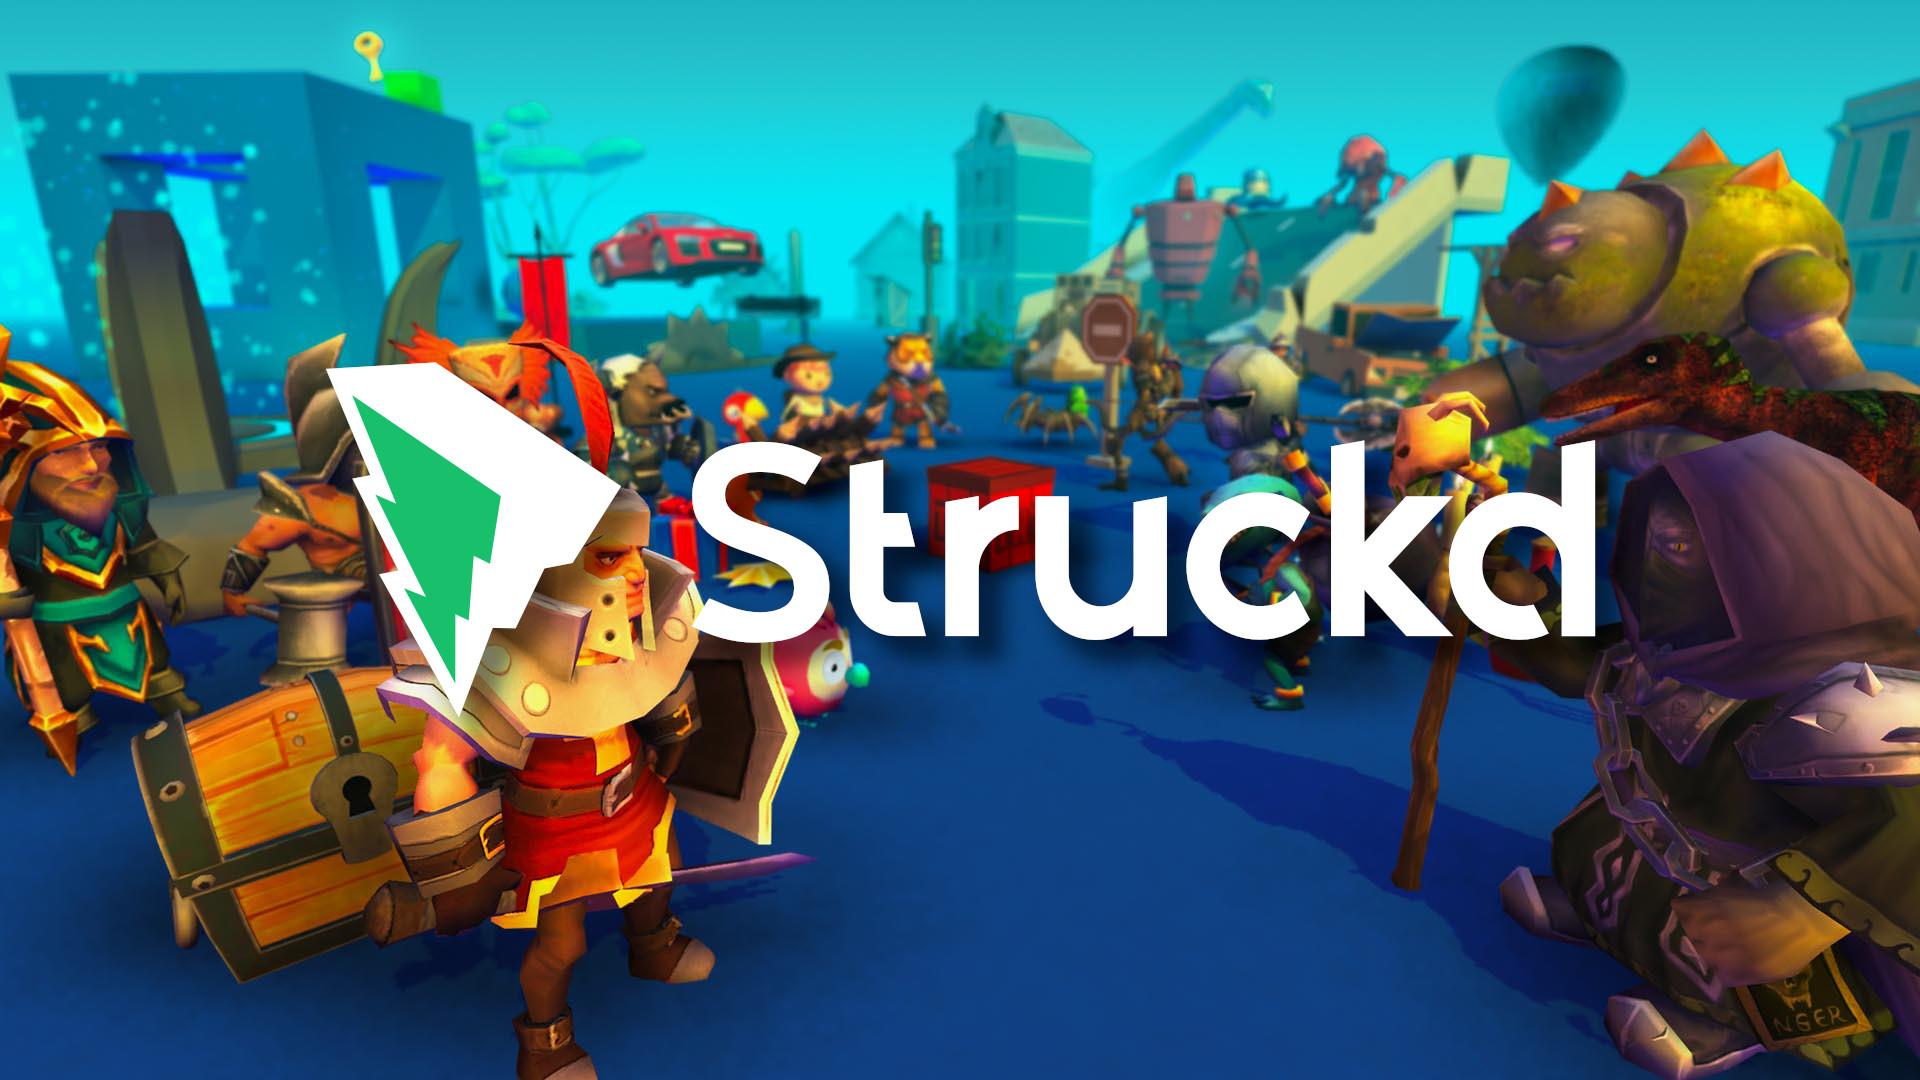 More Than 1 Million Games Created On Mobile Gaming Platform Struckd